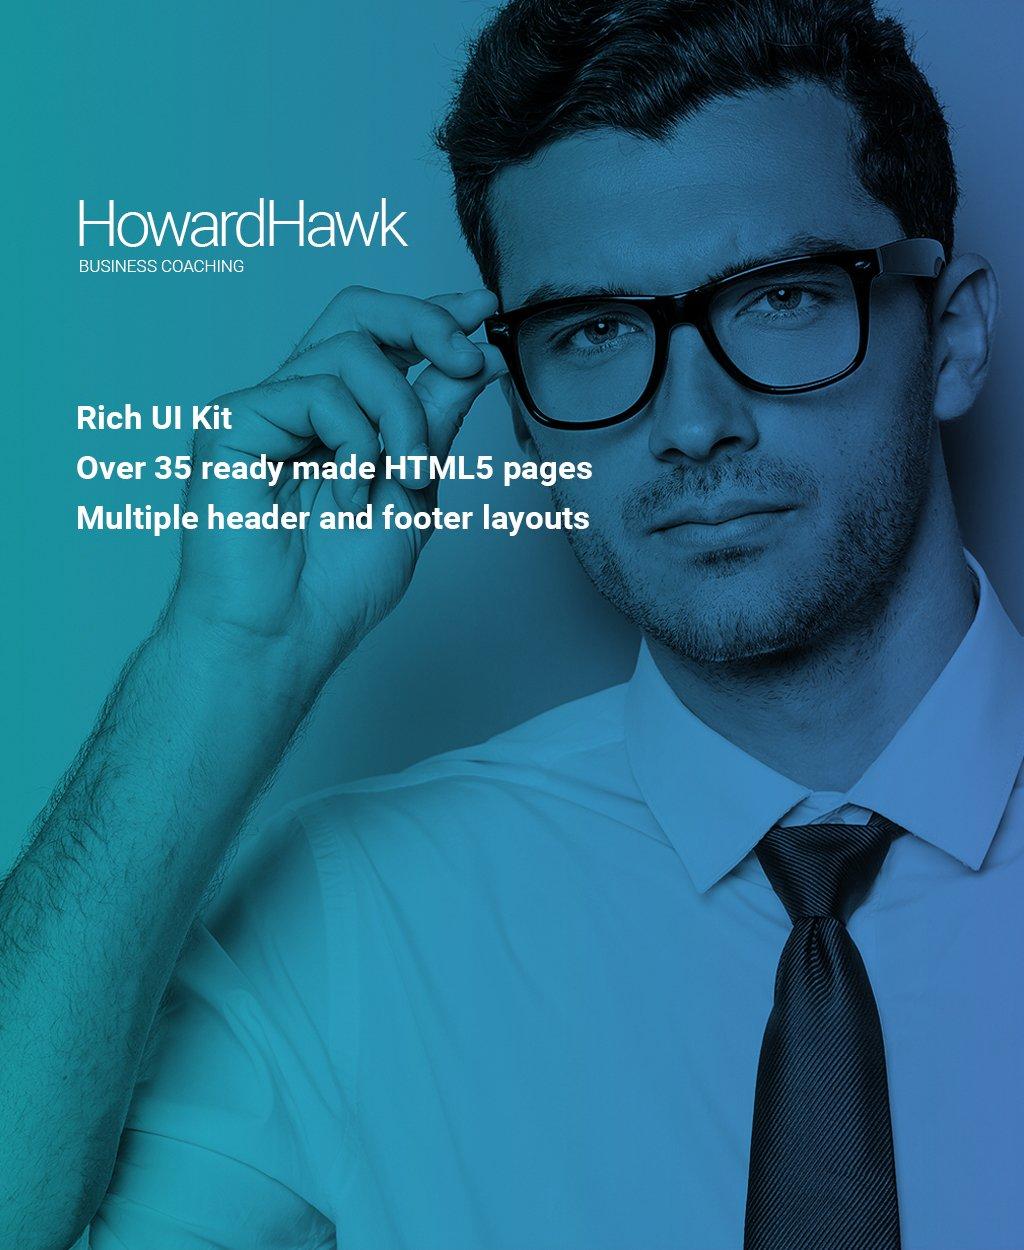 HowardHawk - Business Coaching Multipage Website Template - screenshot